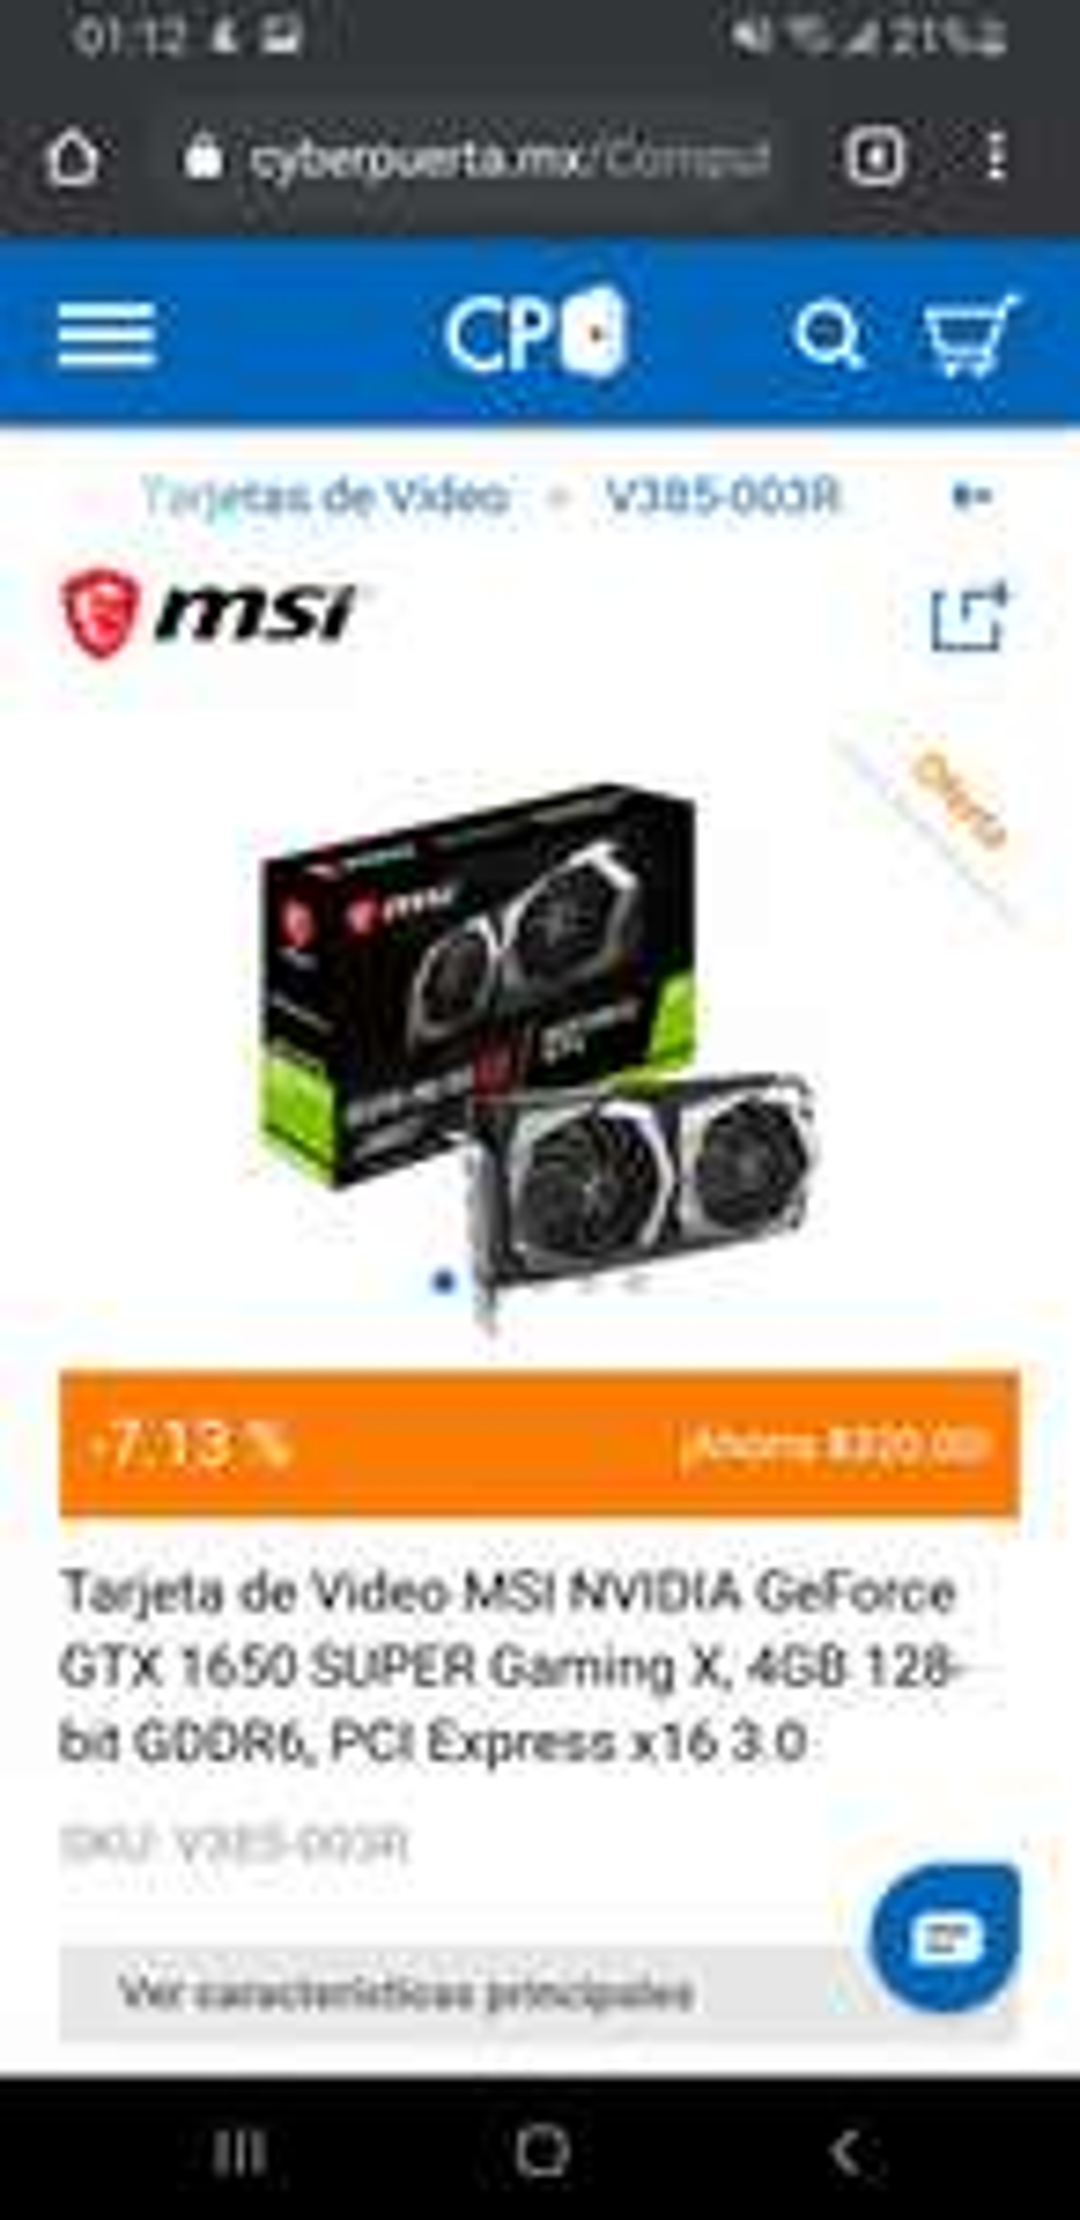 Cyberpuerta: MSI 1650 super Gaming X